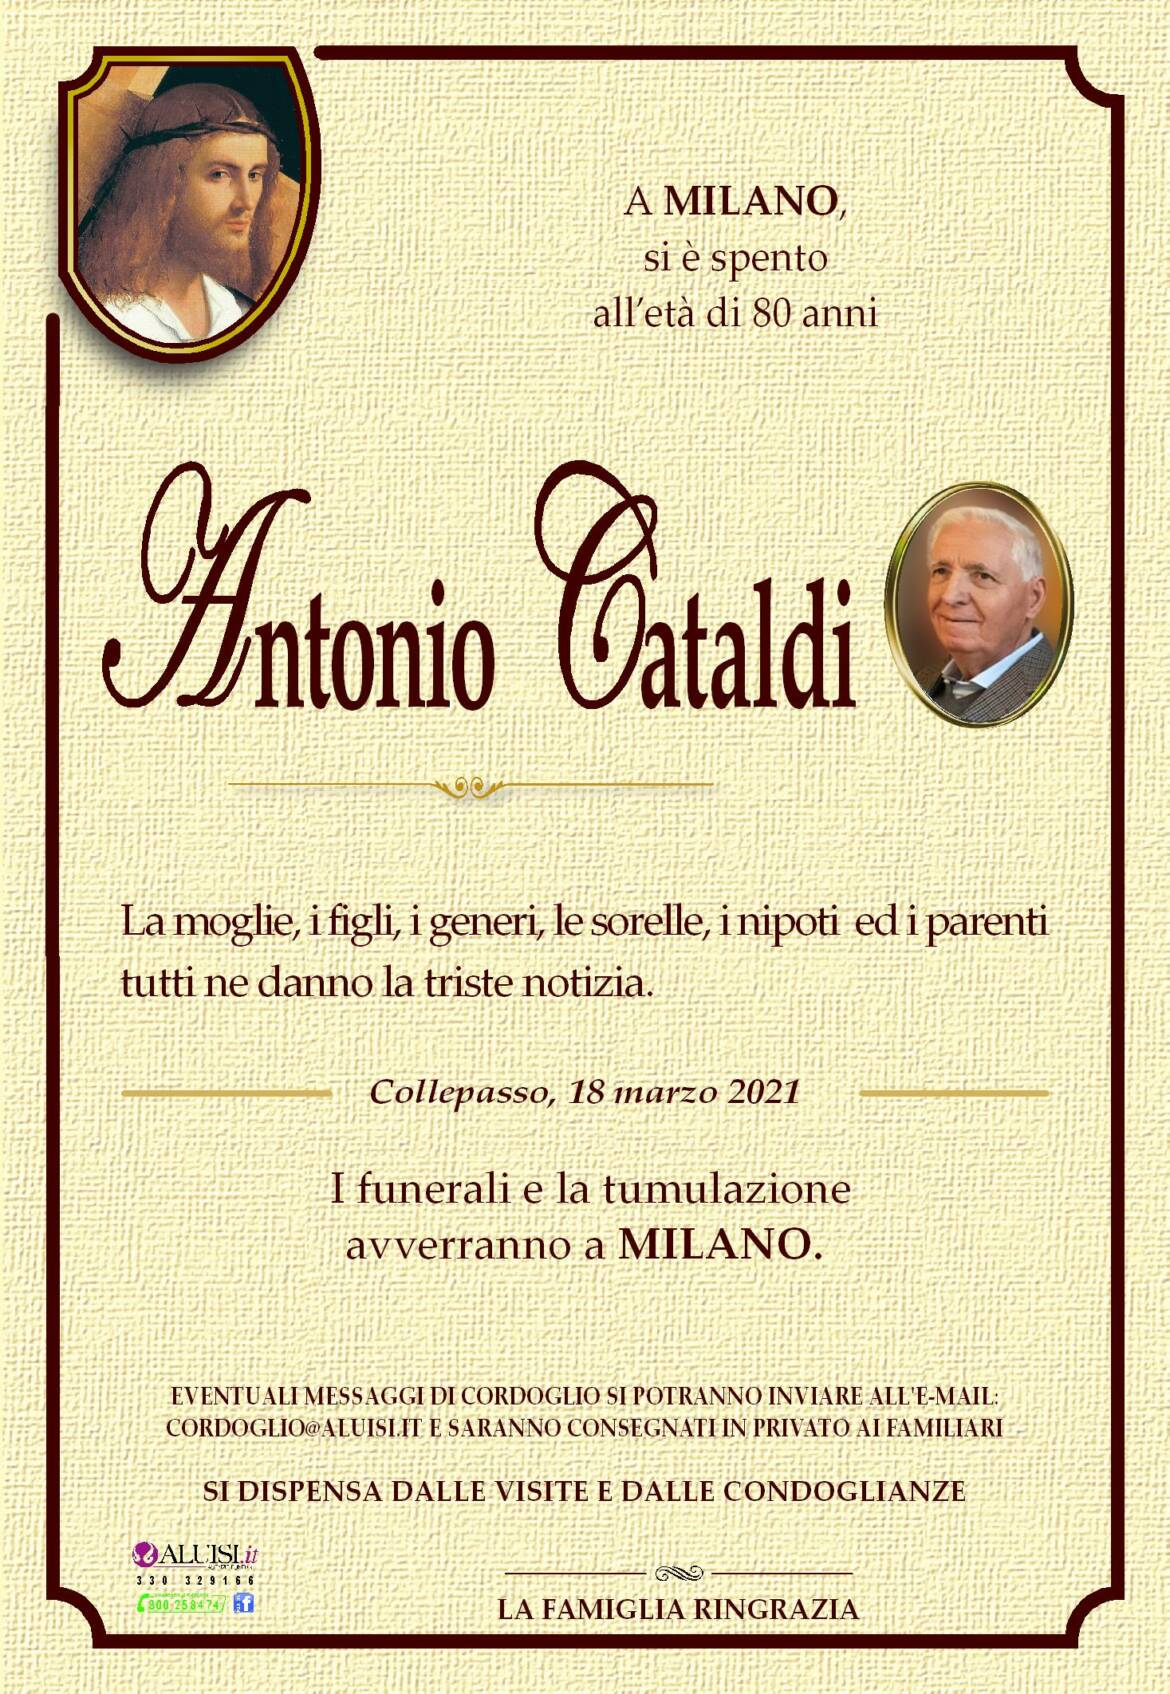 Annuncio-ANTONIO-CATALDI-COLLEPASSO-MILANO-1.jpg